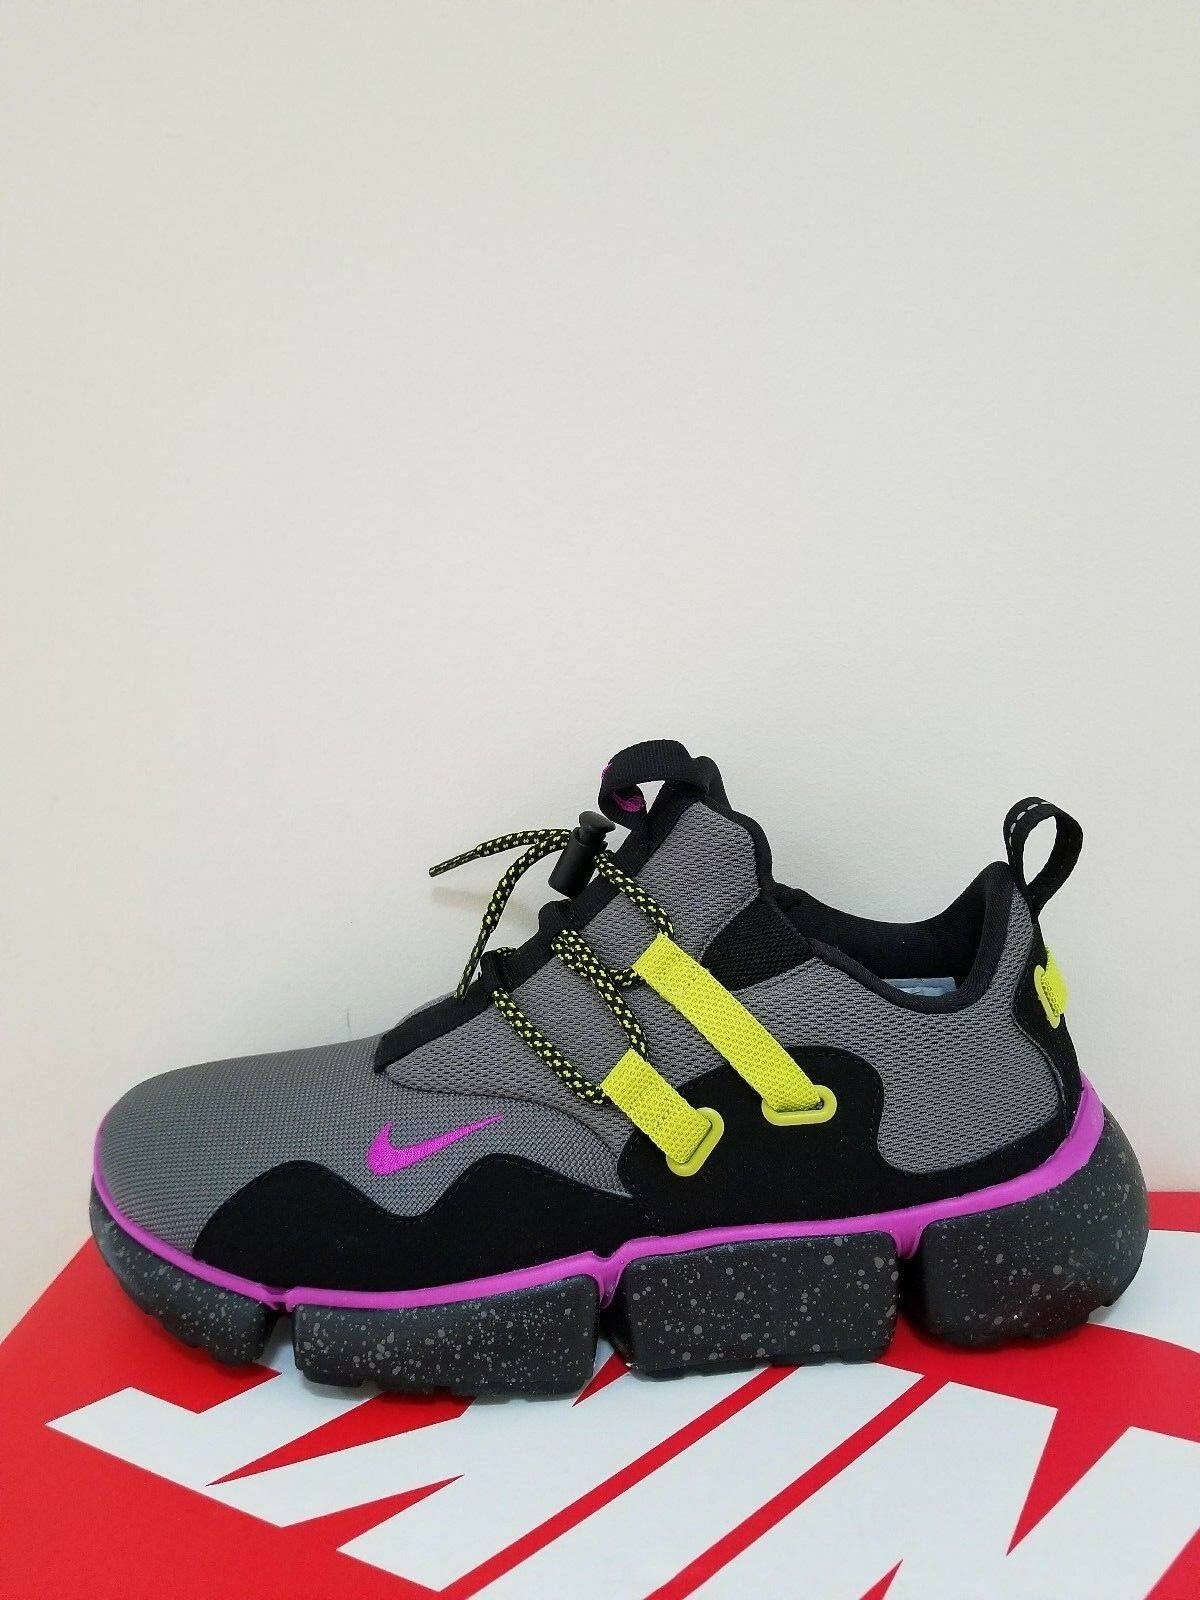 Nike männer taschenmesser dm schuhe schuhe schuhe in größe 10 nib b4eba7